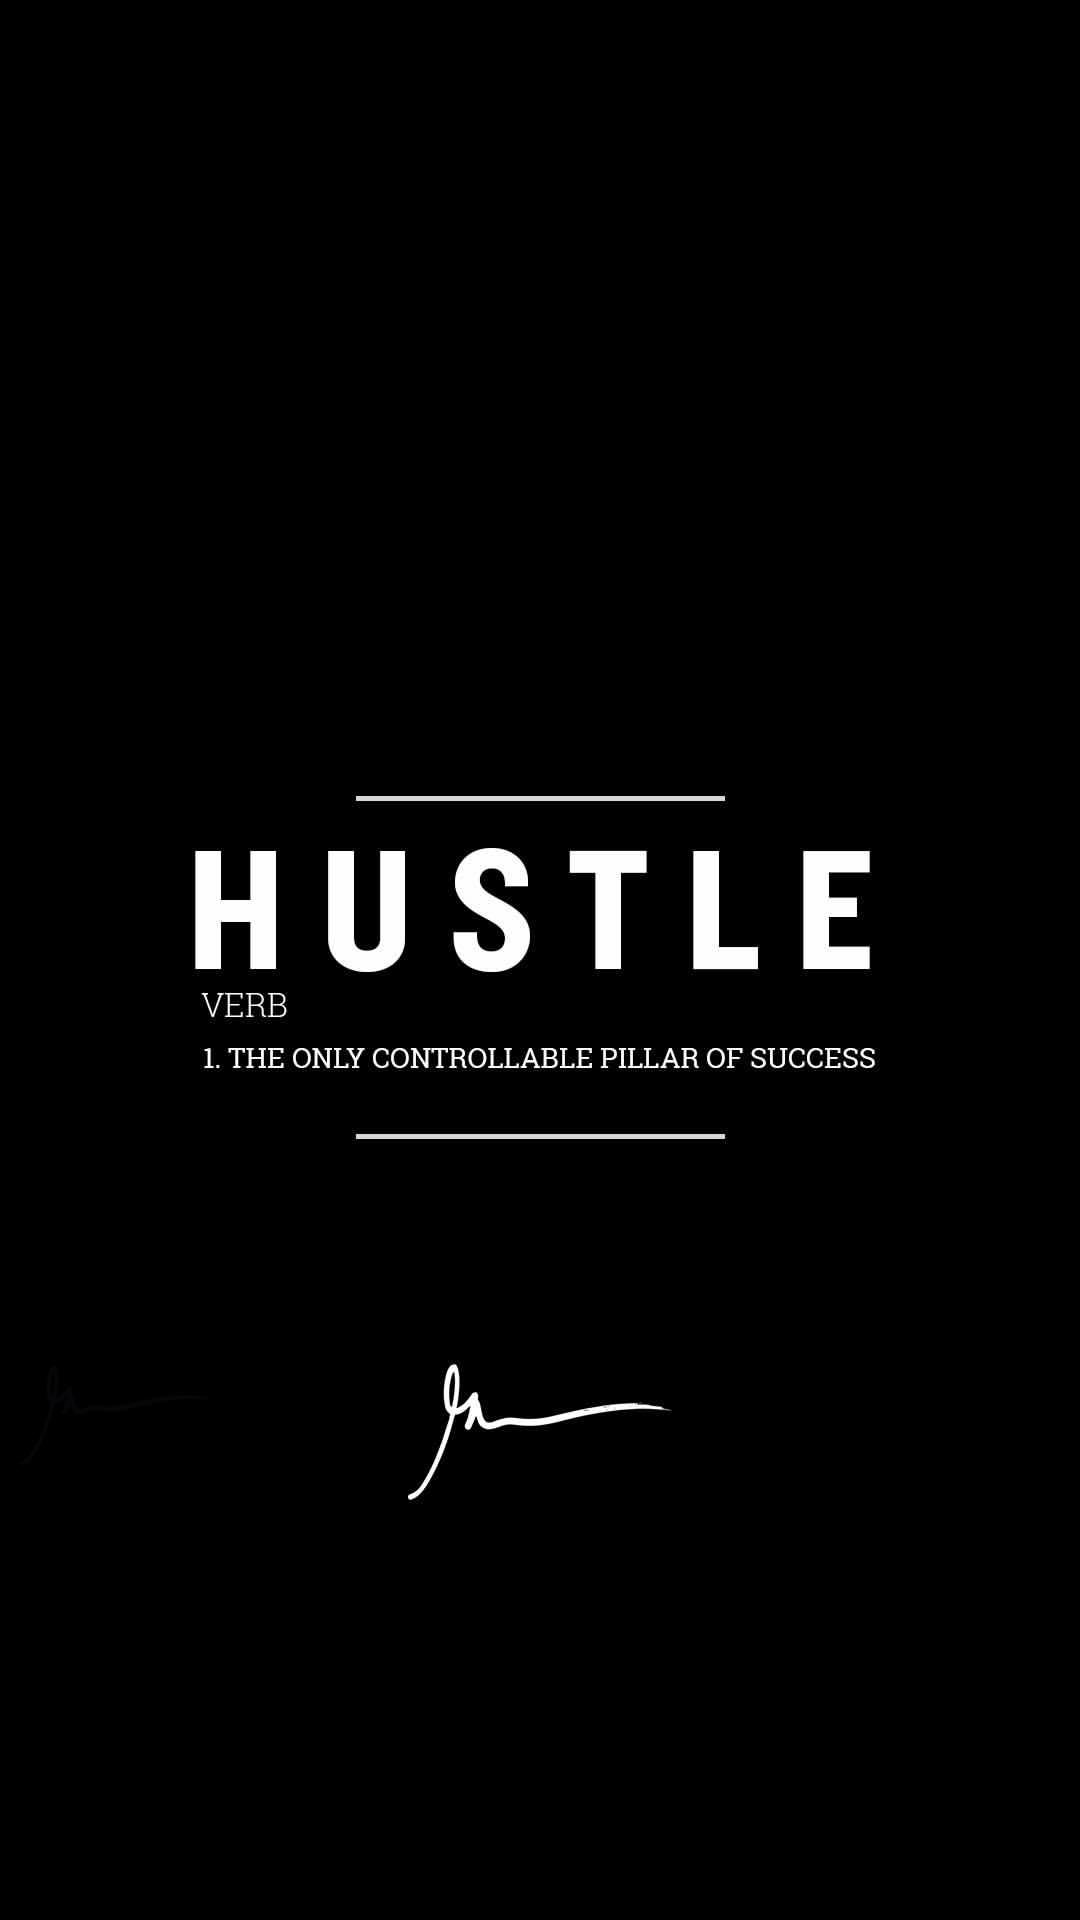 Motivational Quotes Hd Mobile Wallpaper Gary Vaynerchuk Wallpapers